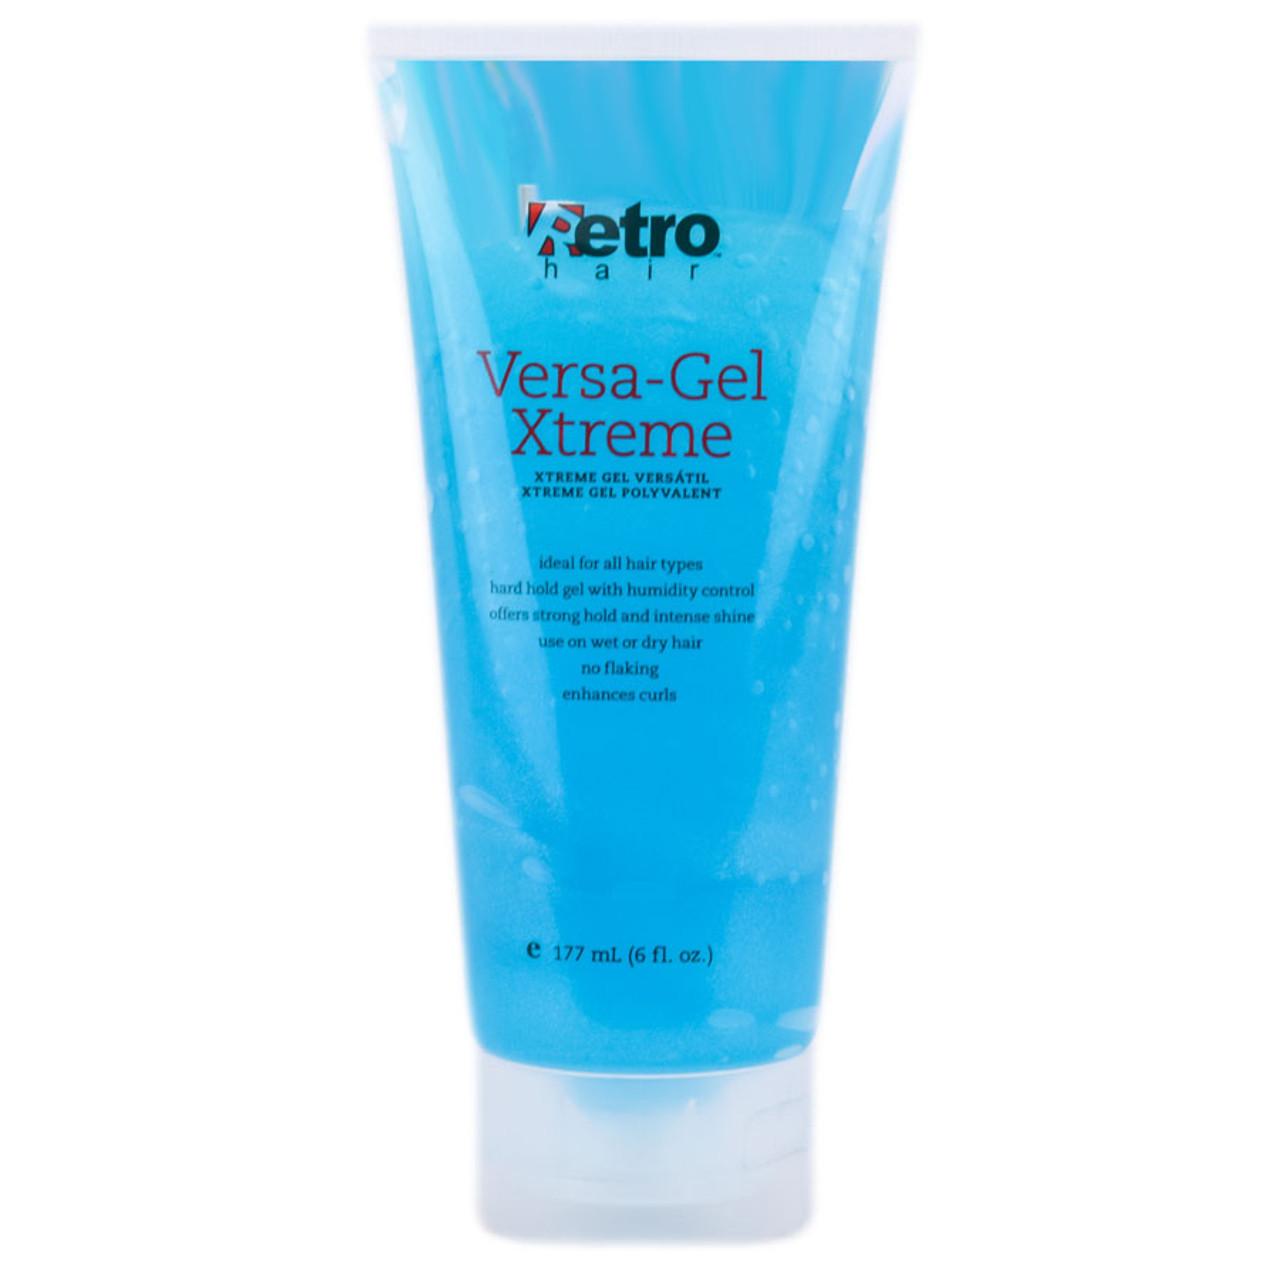 Retro Hair Versa Gel Xtreme Sleekshop Formerly Sleekhair